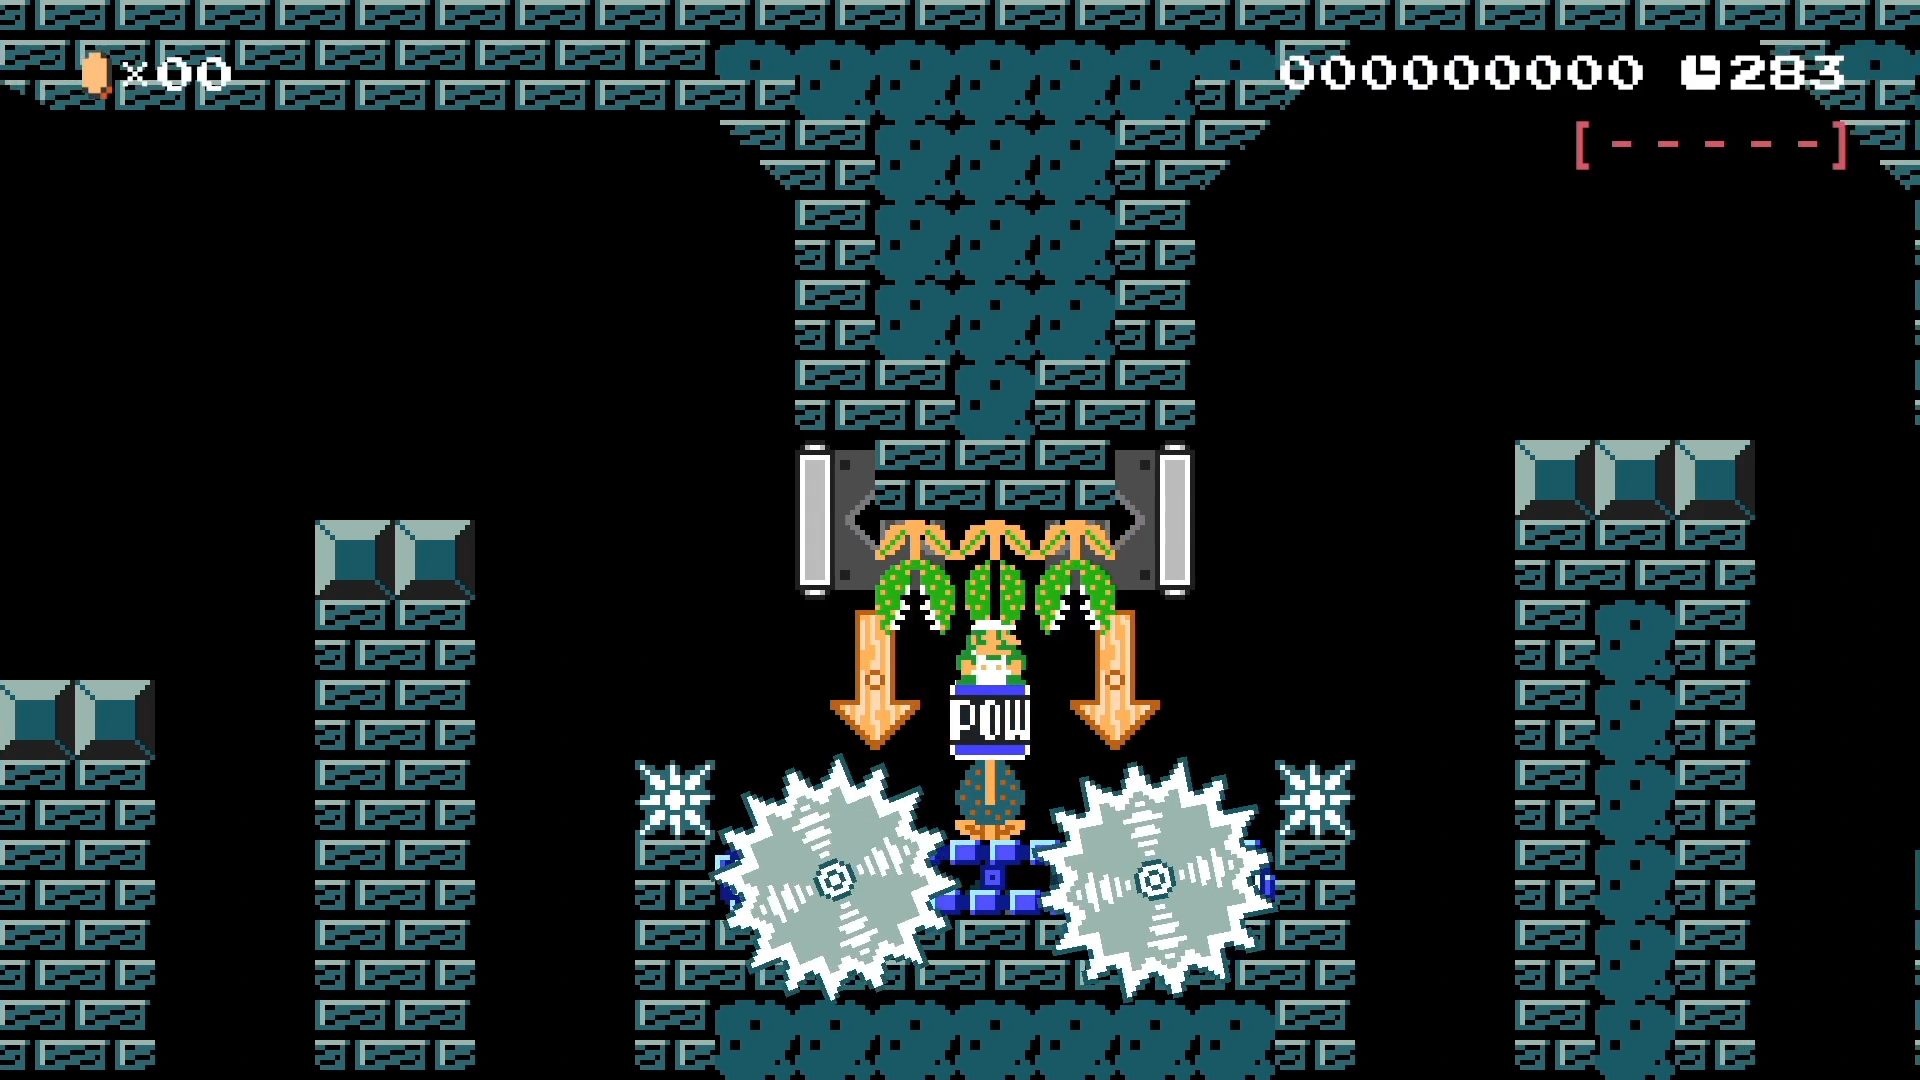 Super Mario Maker 2 - 4YMM